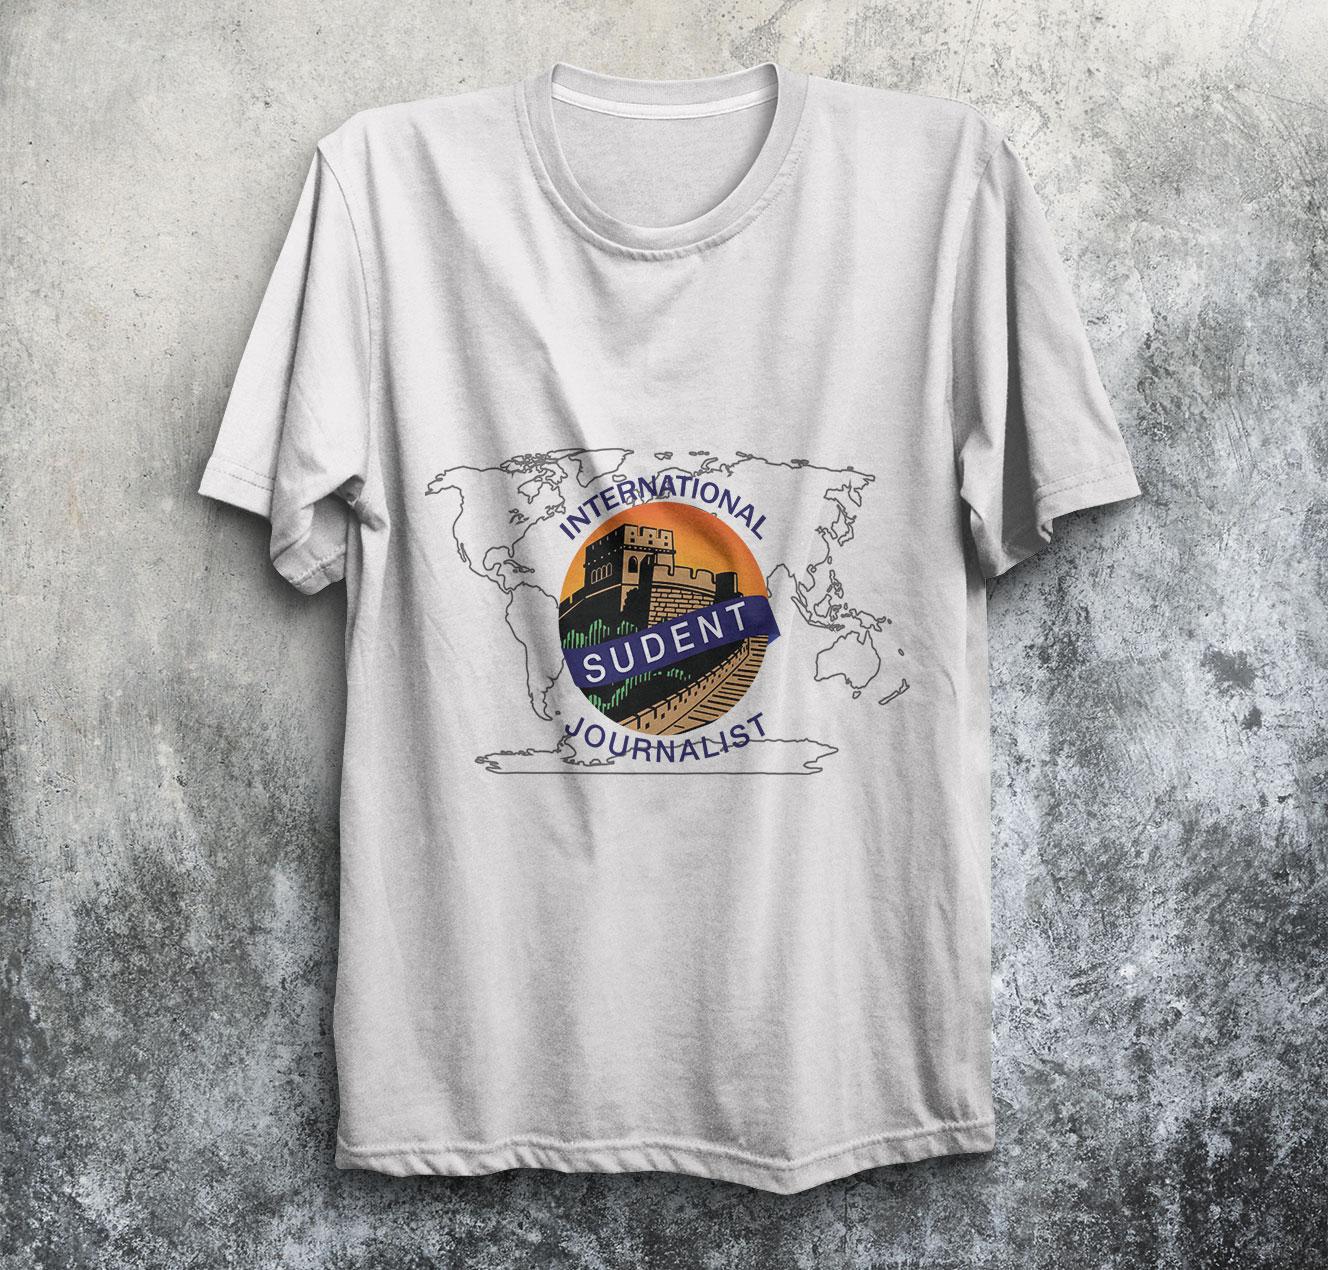 I will do amazing typography t shirt design